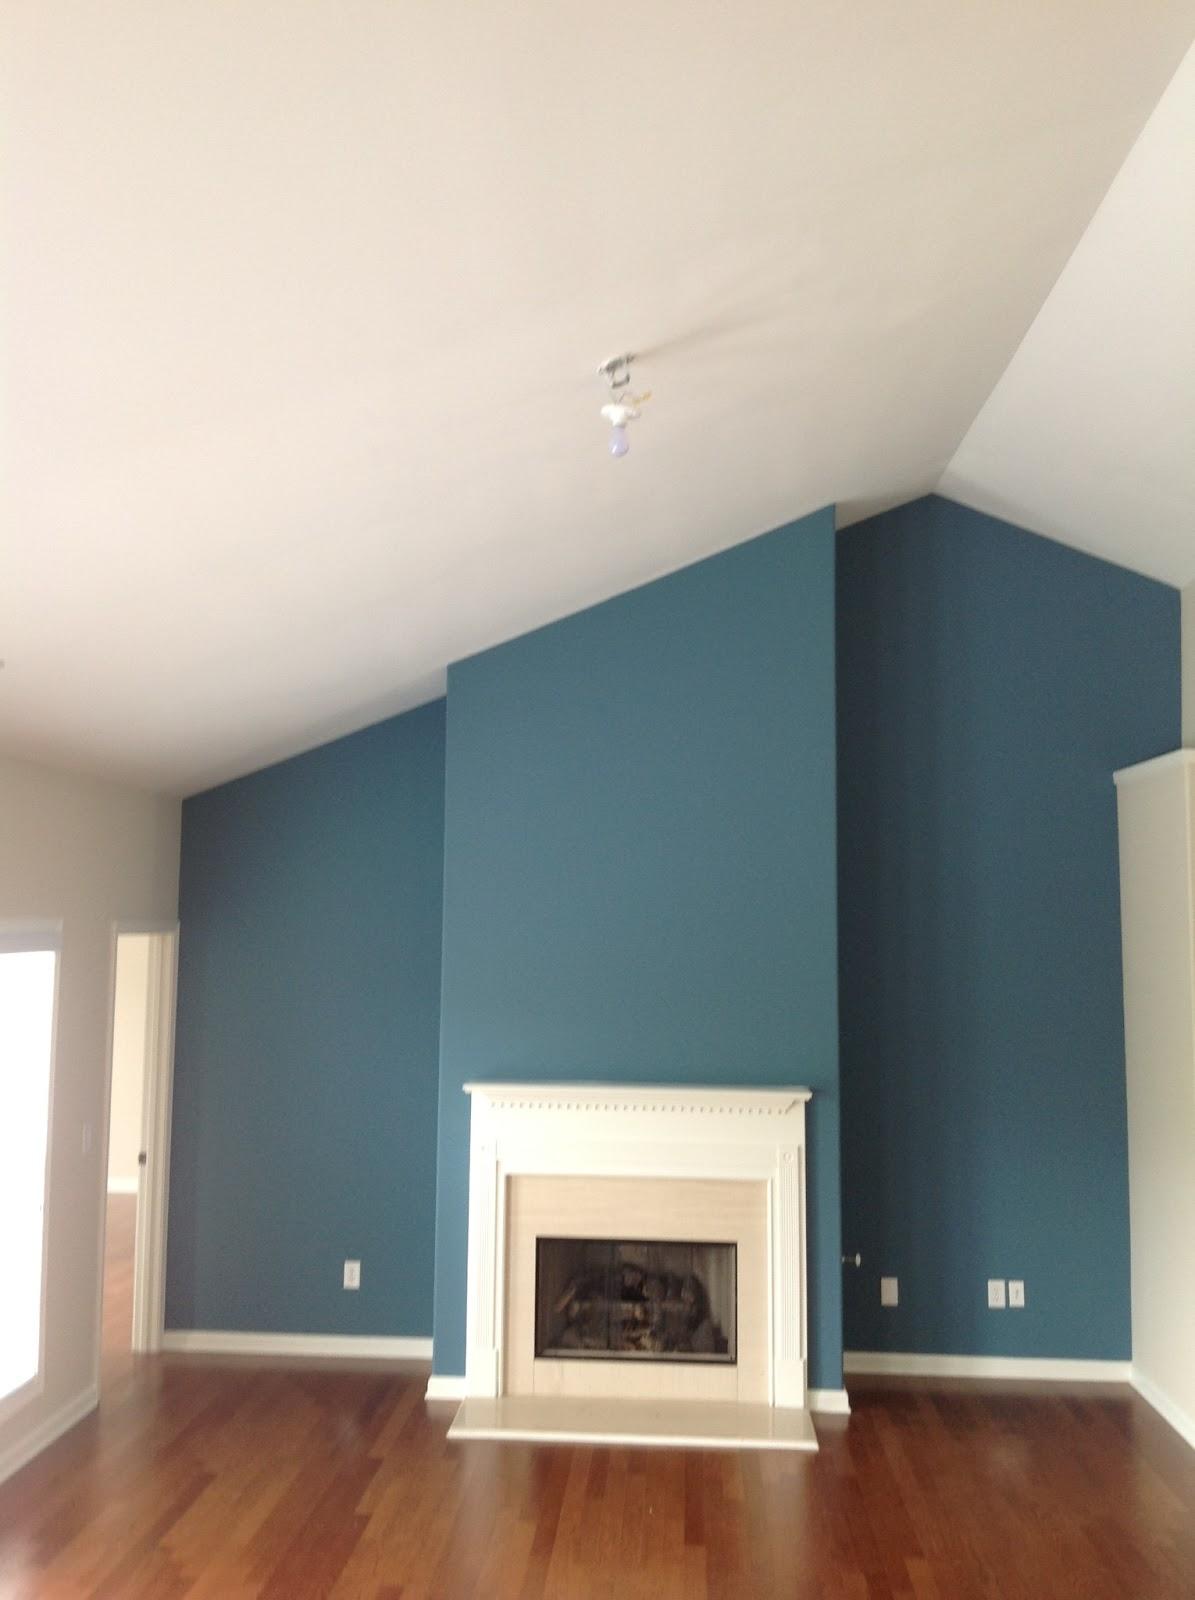 Teal and Brown Living Room | peacock teal, chocolate brown ...